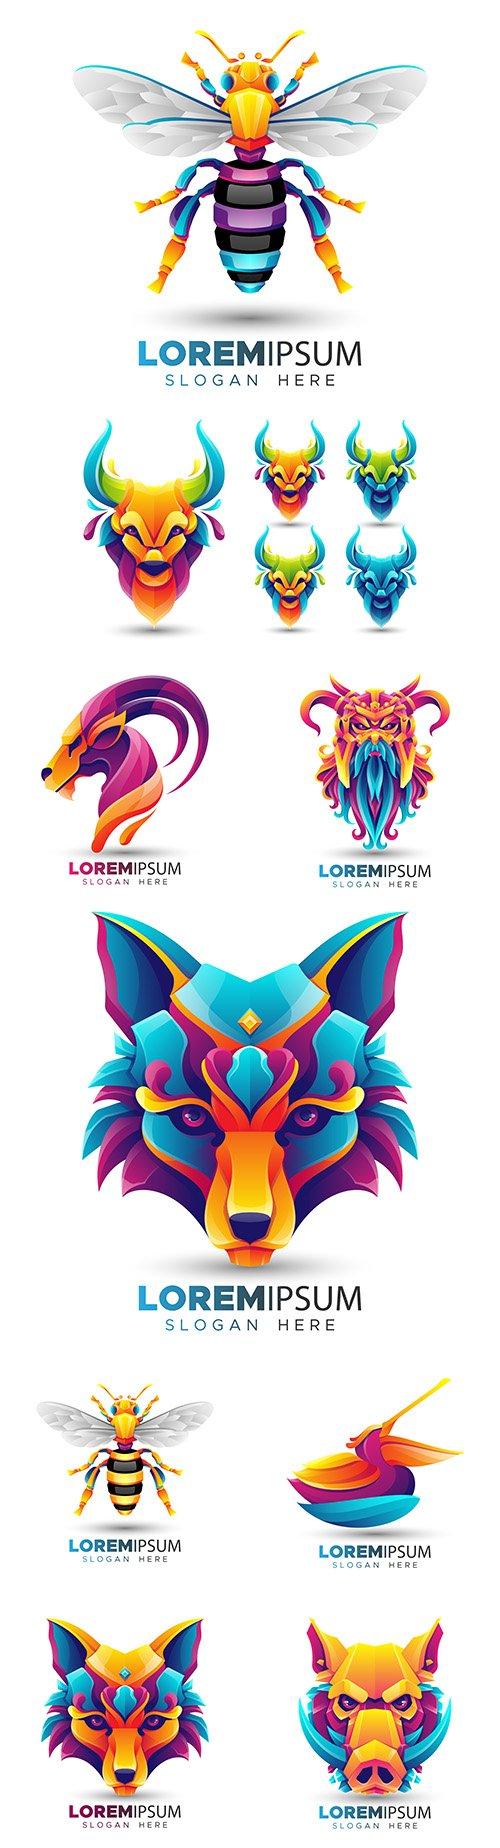 Origami and animal logo design flat color modern 9